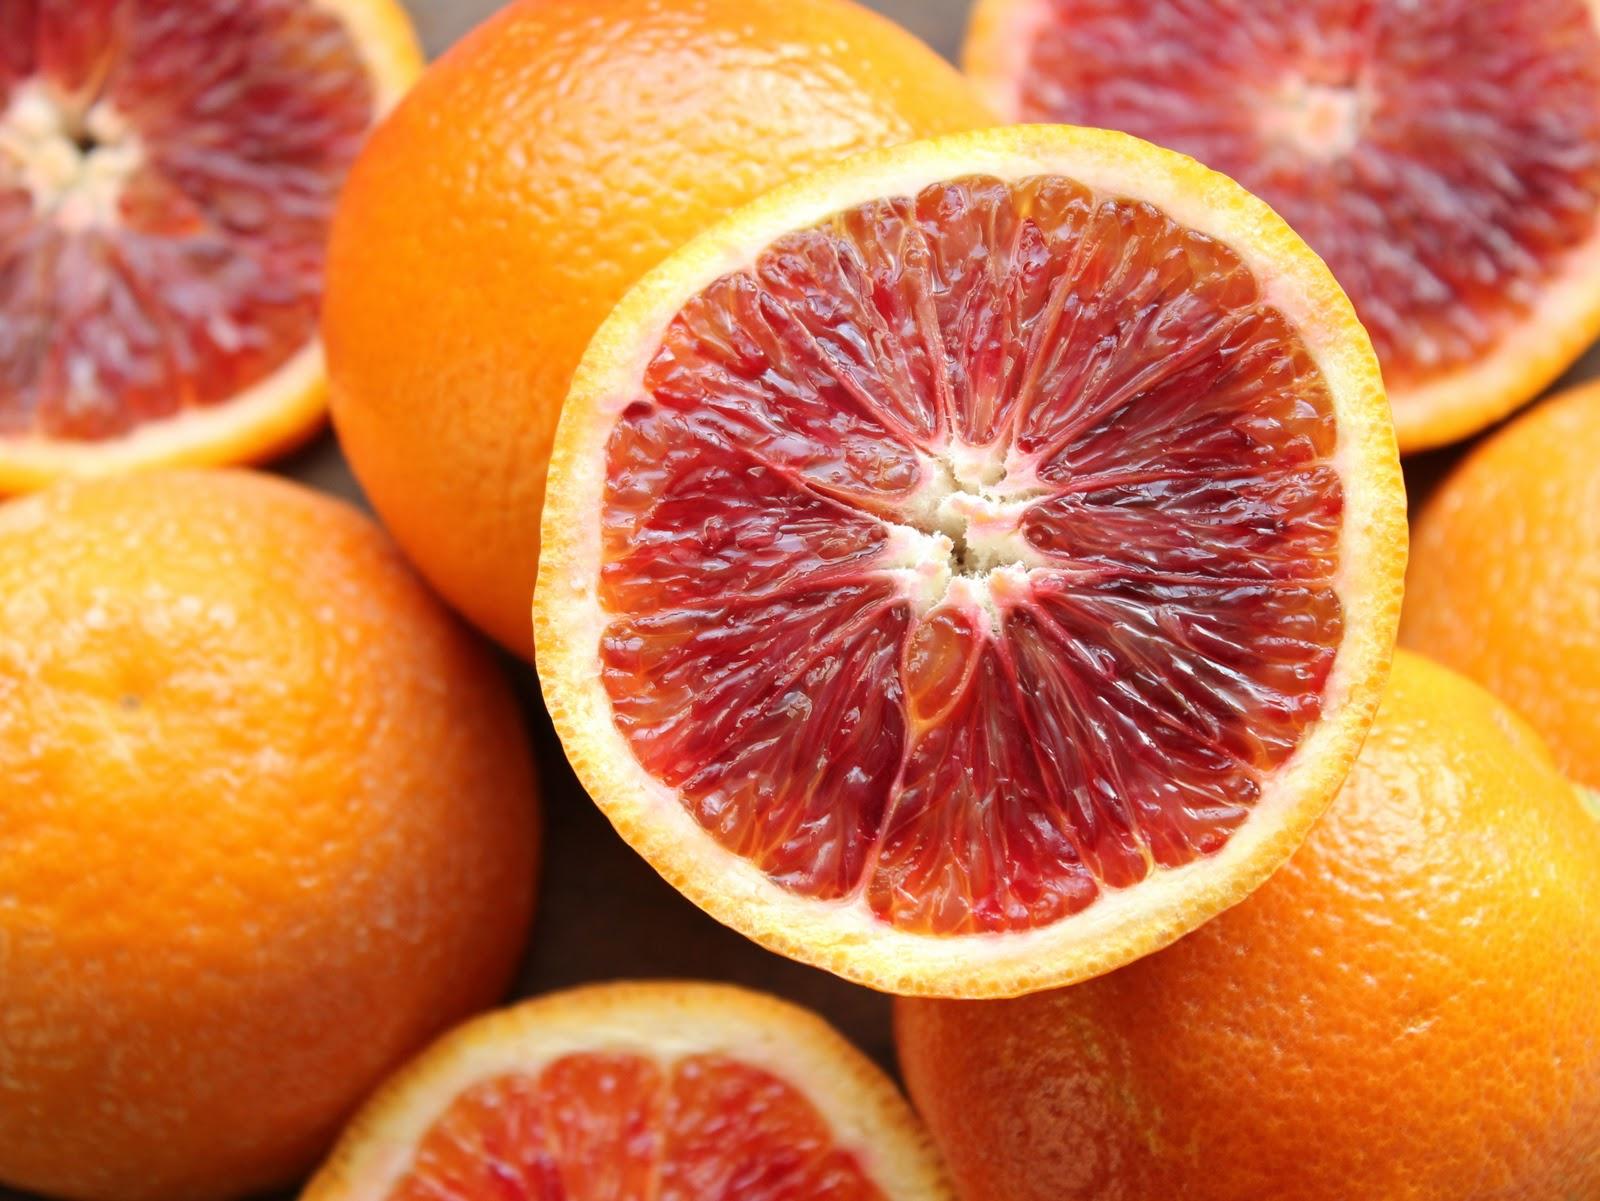 blood-oranges2.jpg